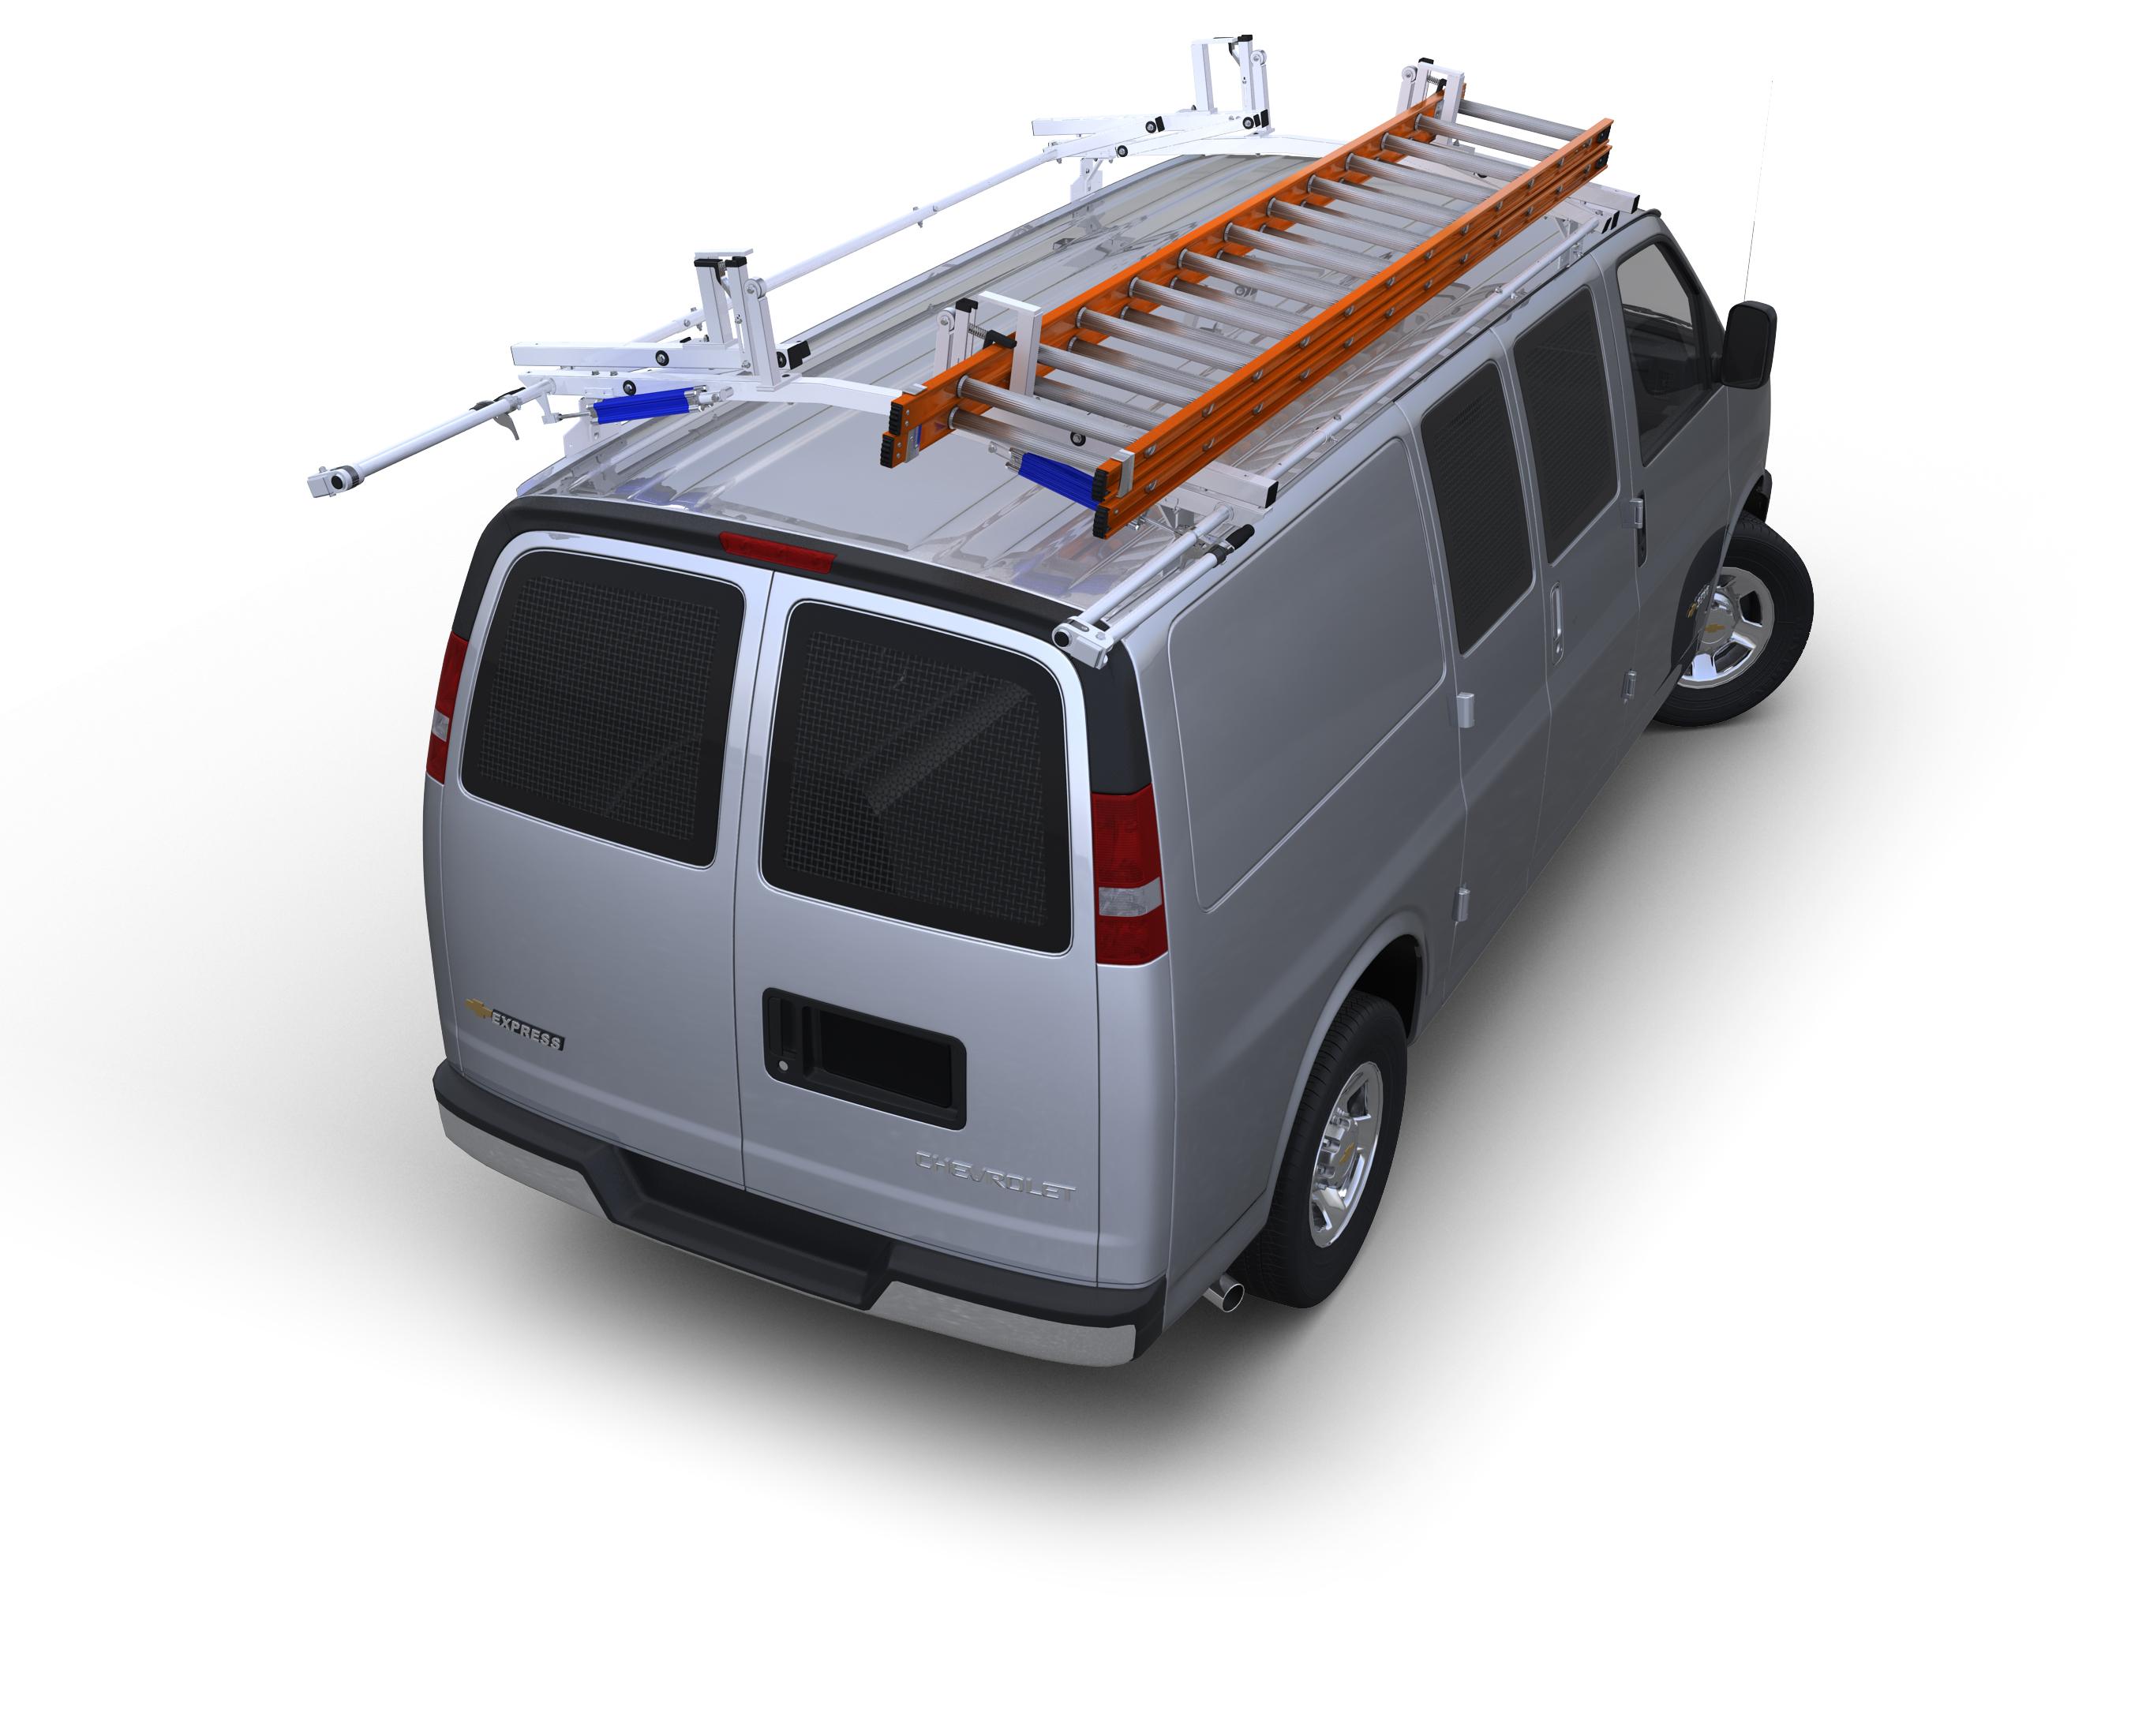 Hot Dip Galvanized Van Ladders-SAVE 38%!